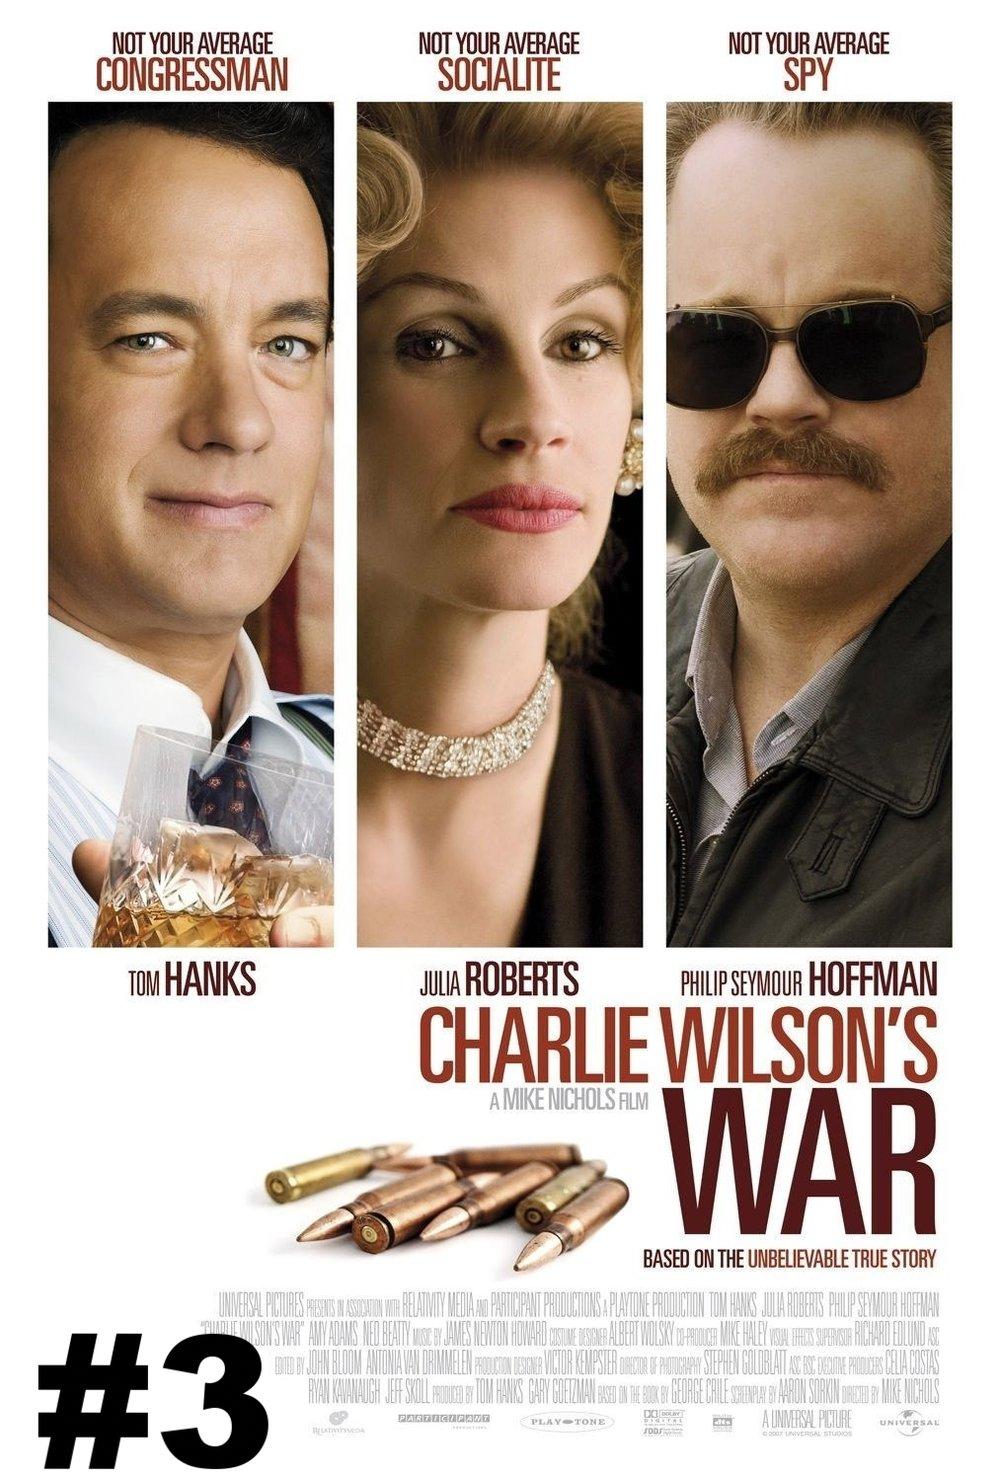 charlie-wilsons-war-charlie-wilsons-war.23280.jpg